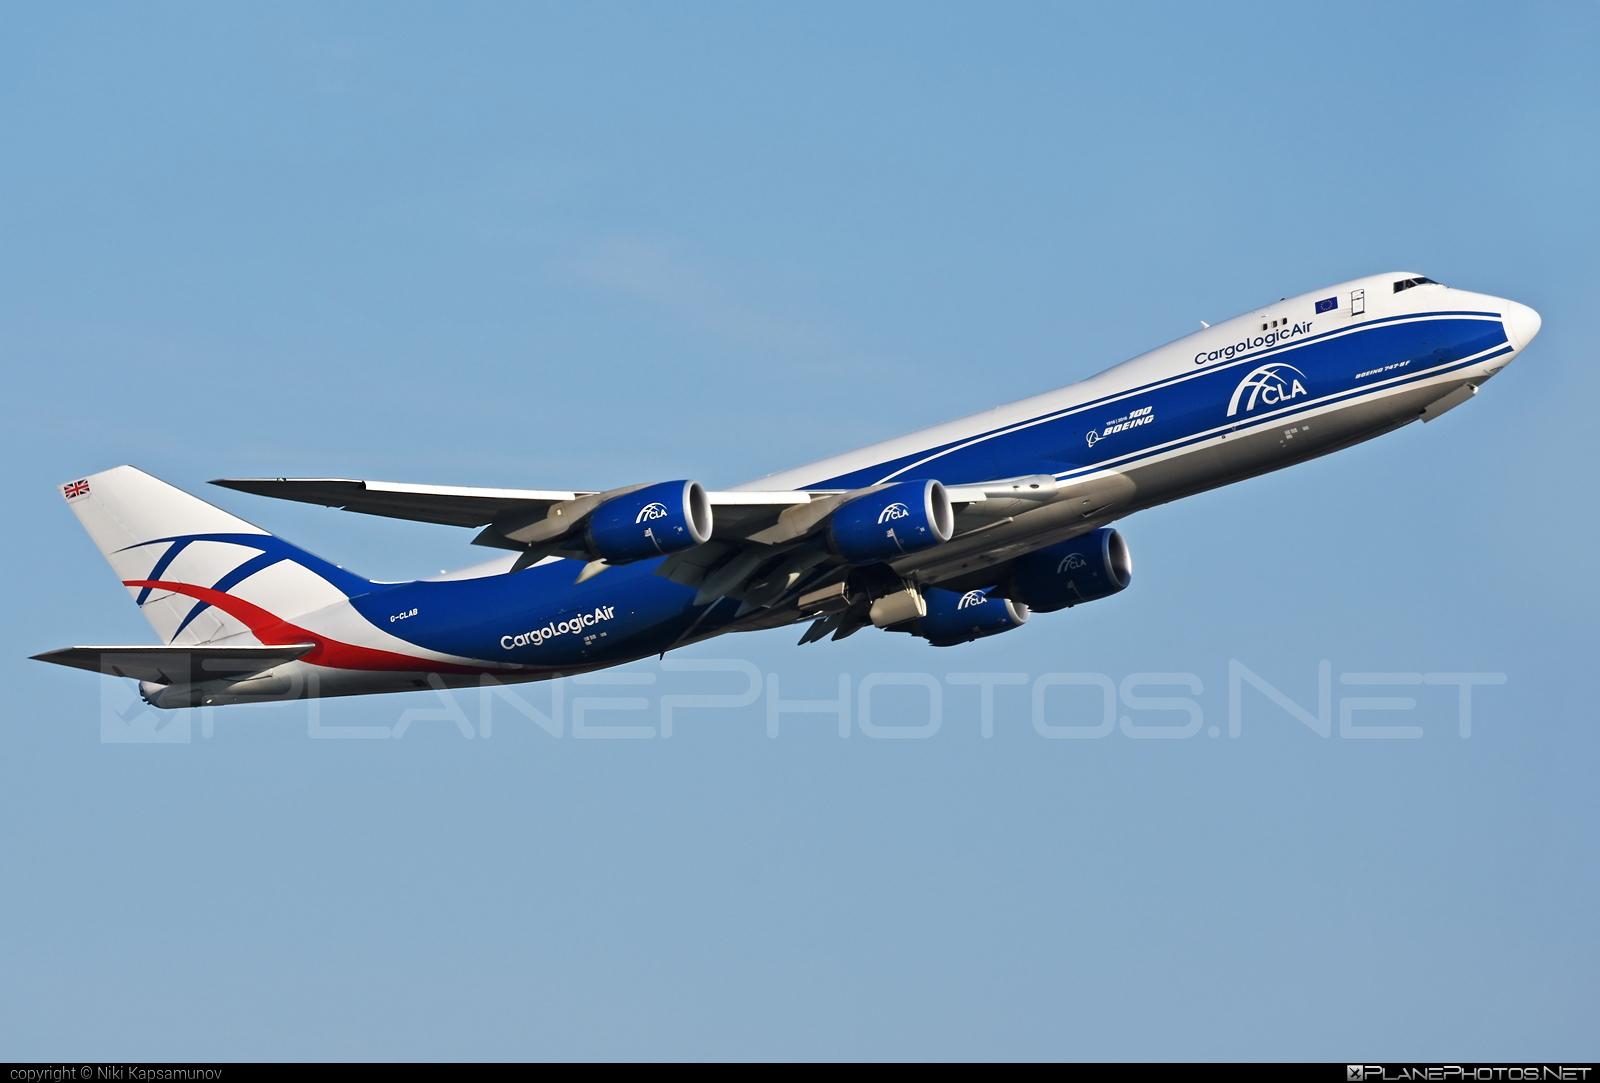 Boeing 747-8F - G-CLAB operated by CargoLogicAir #b747 #b747f #b747freighter #boeing #boeing747 #cargologicair #jumbo